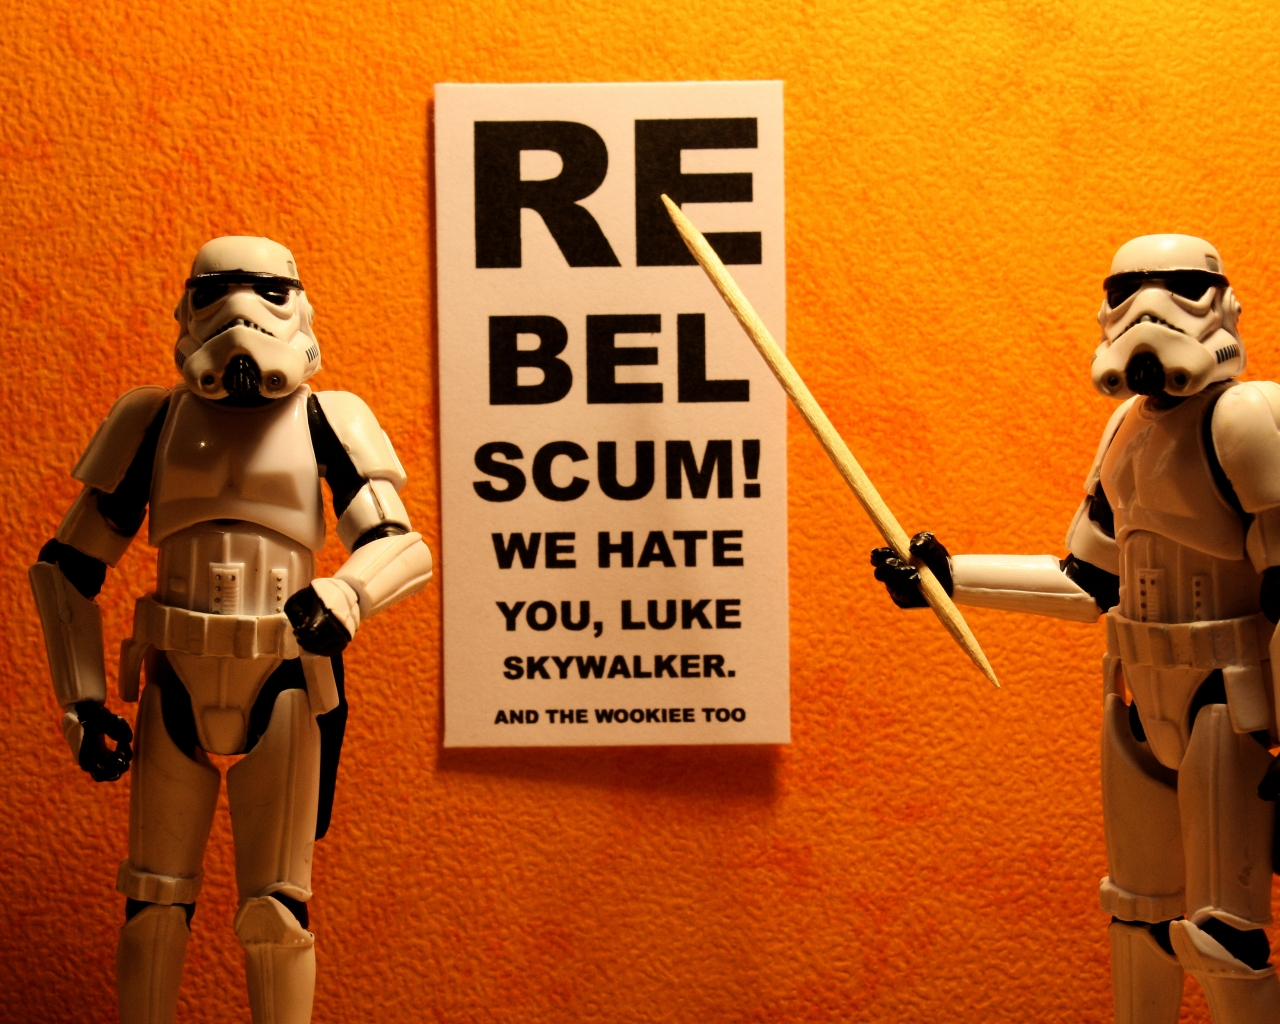 Funny Star Wars Wallpaper Posted By Ryan Walker